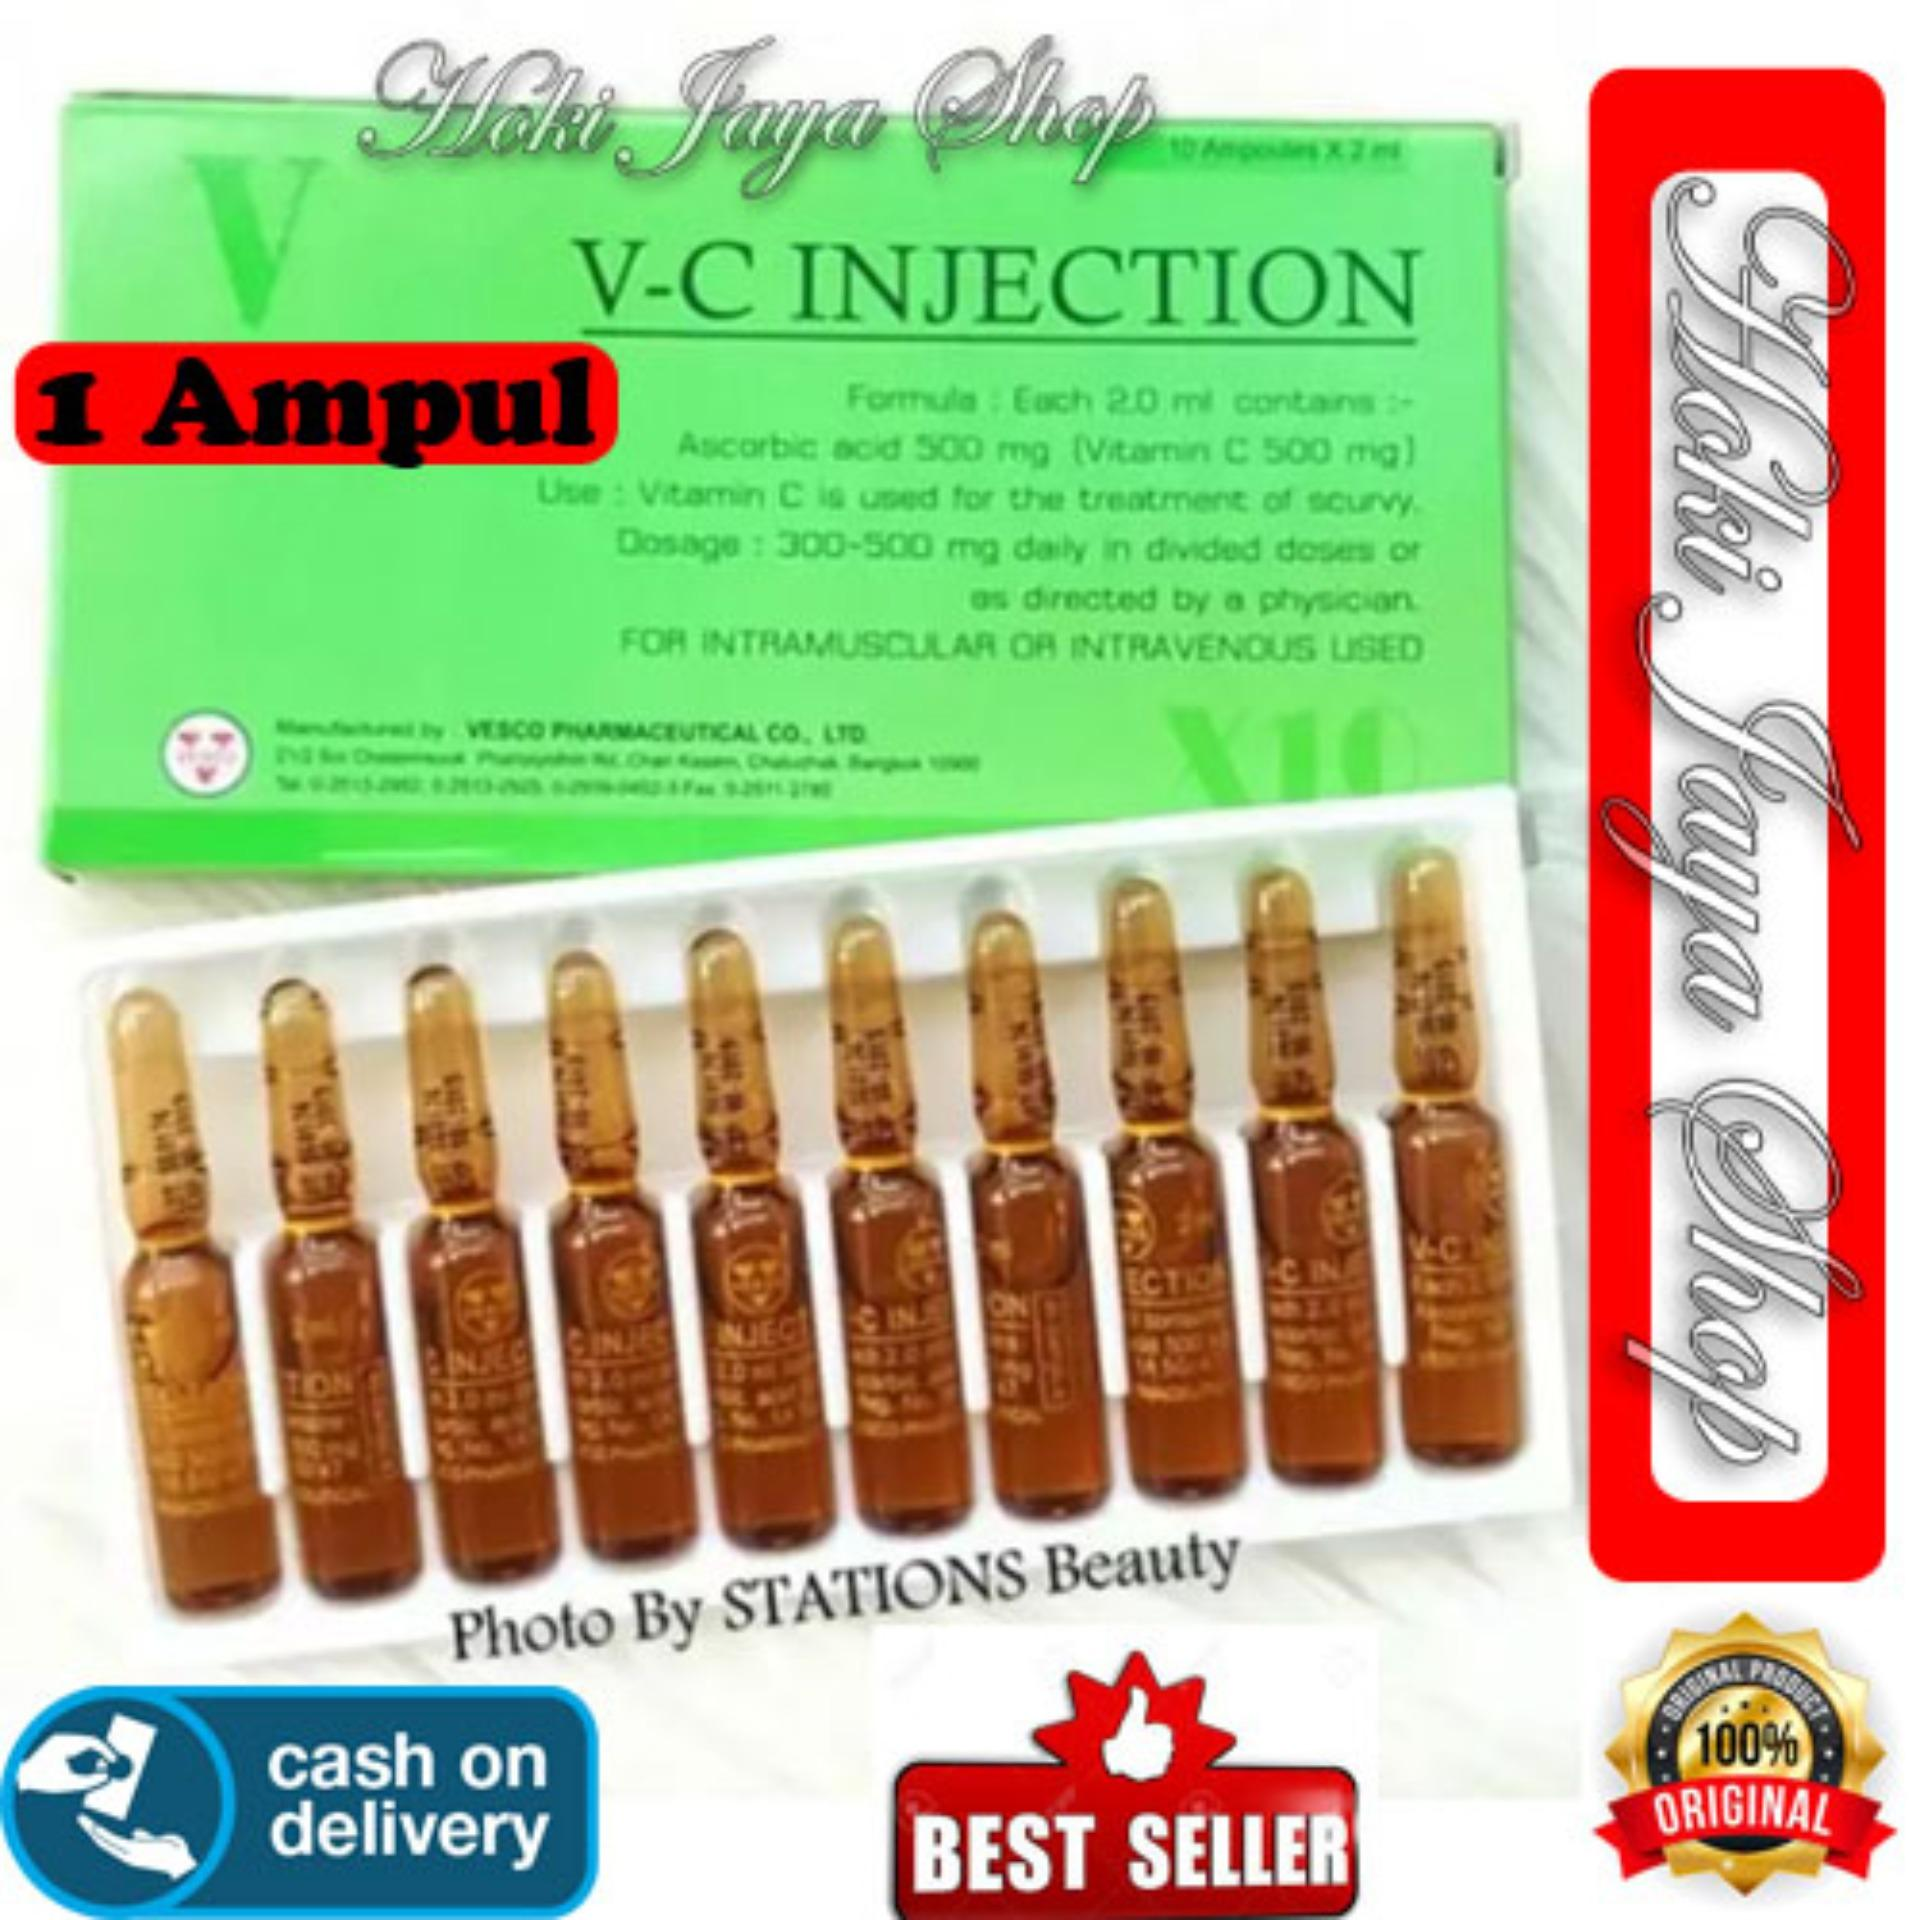 HOKI COD - VC Injection Isi 1 AMPUL - / Vitamin C Injection / VC Injeksi / Serum Vitamin C Ascorib Acid 100% Original Thailand - GM 1